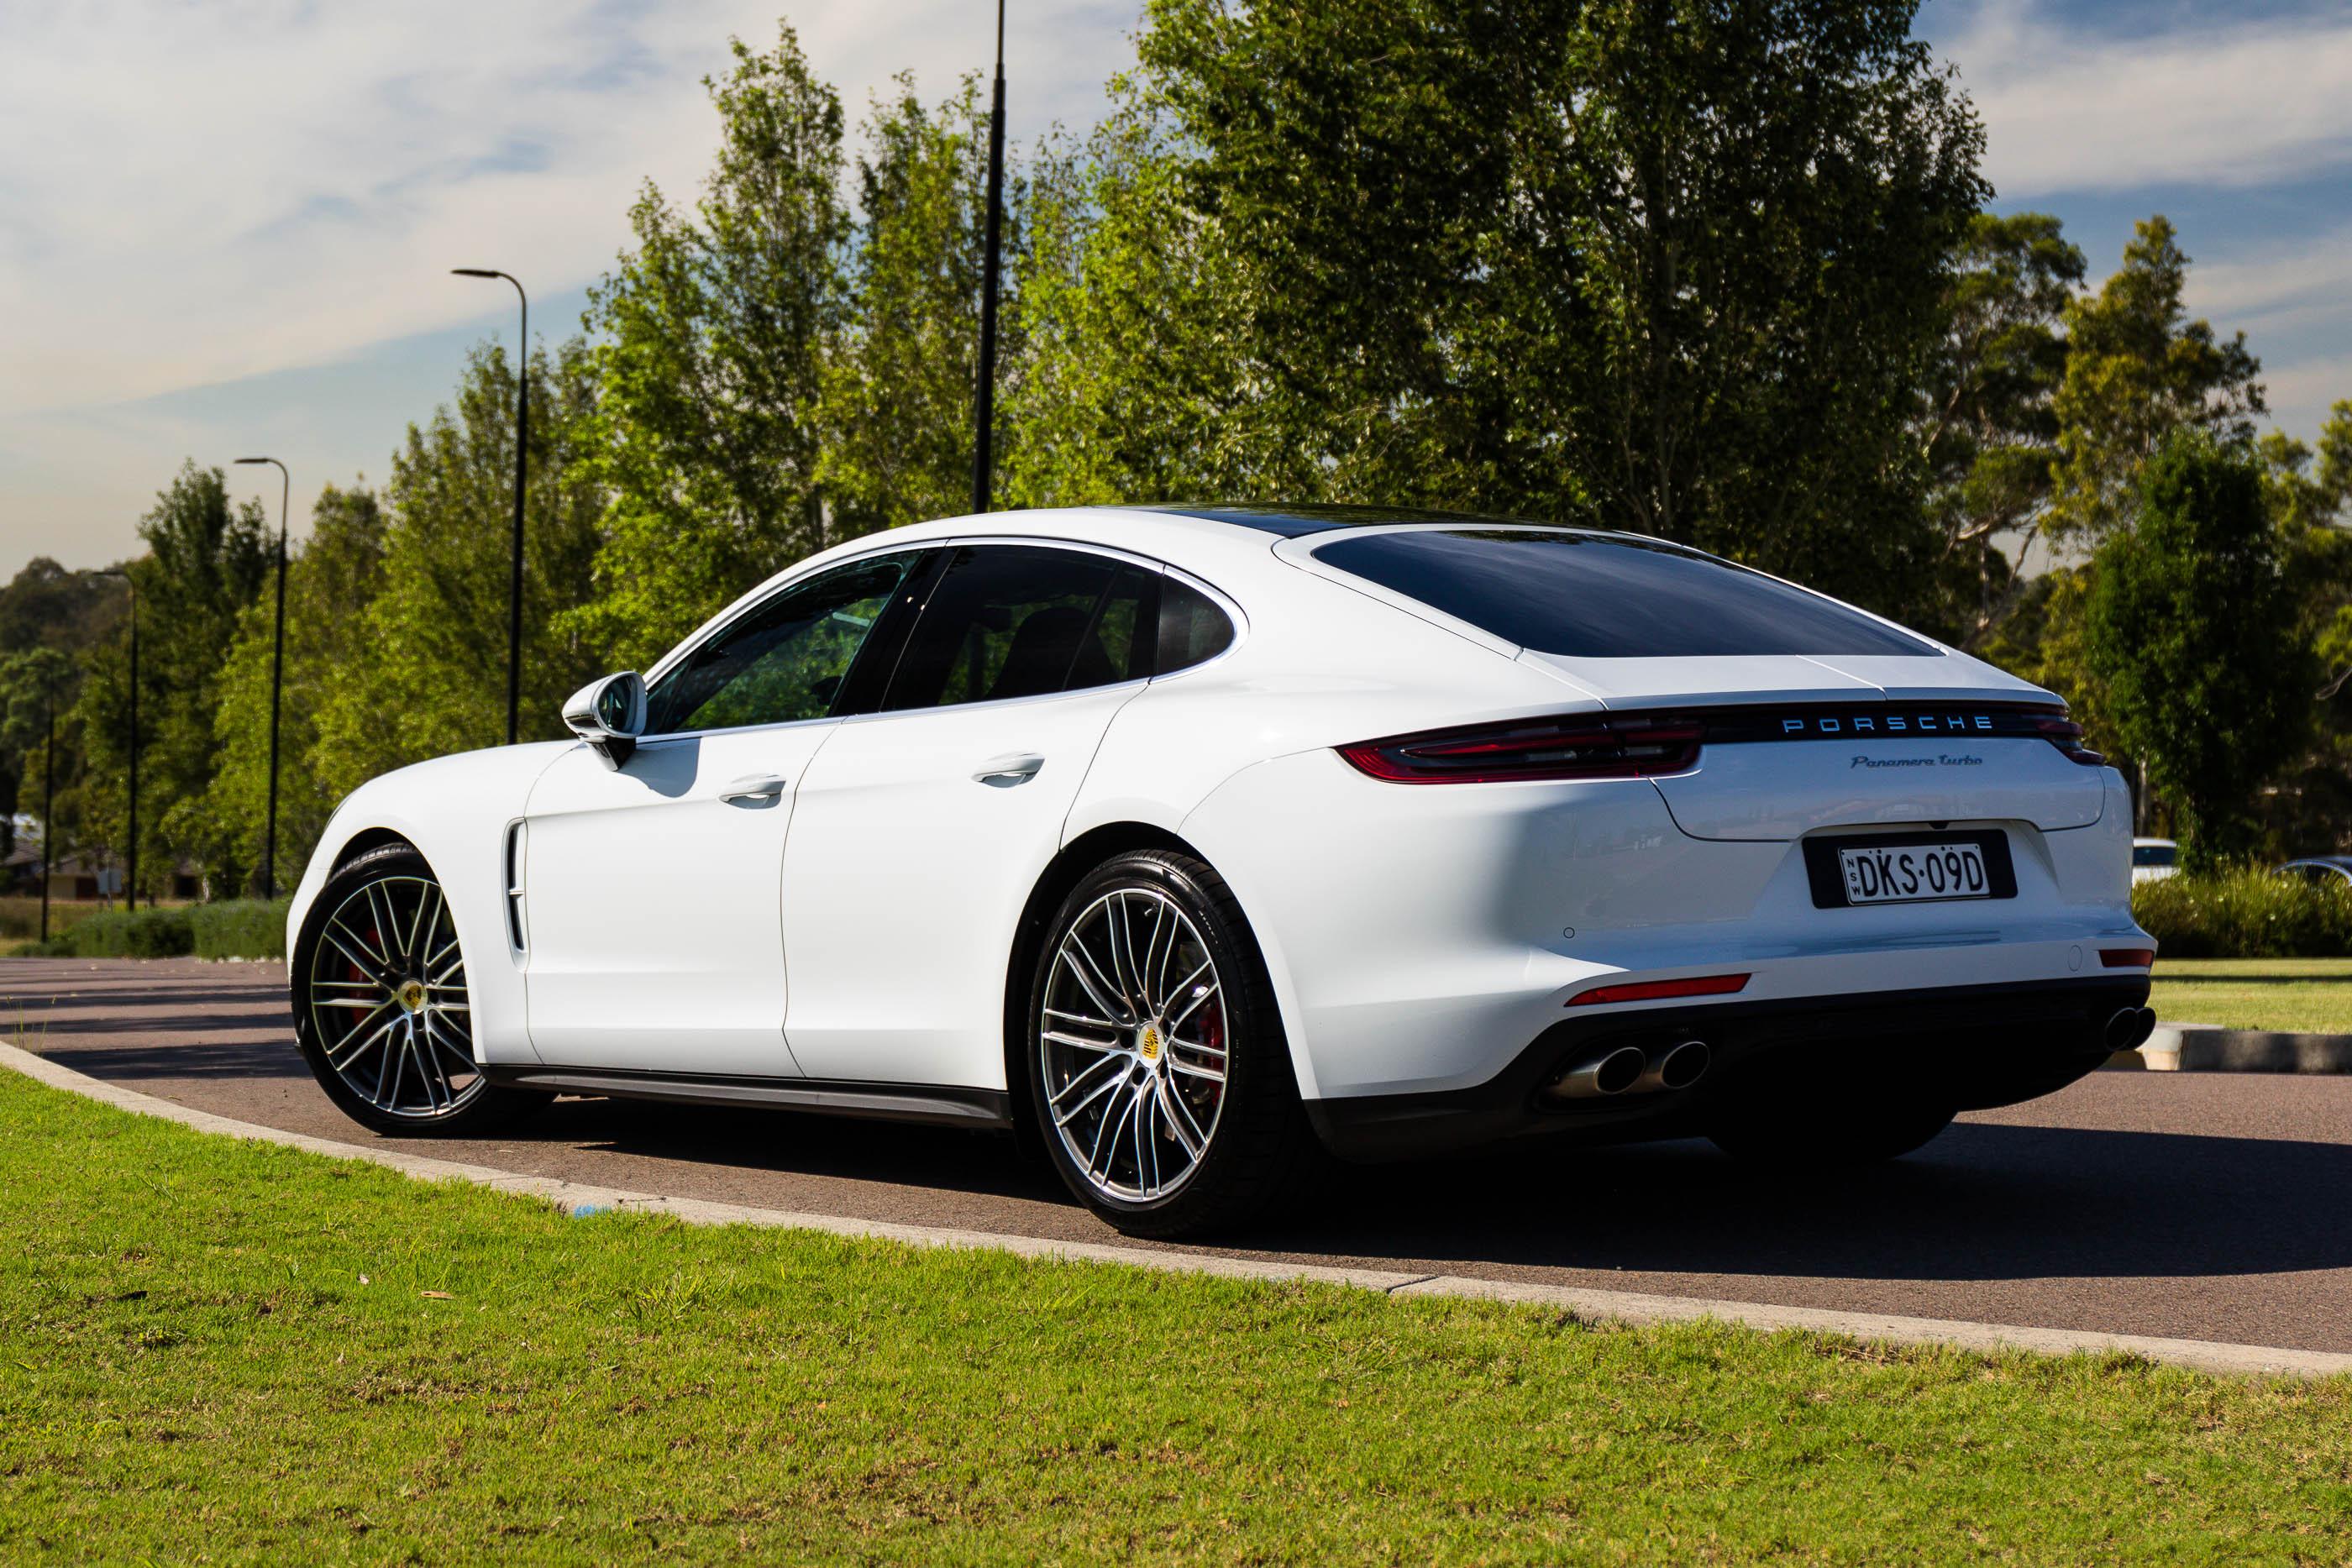 2017 Porsche Panamera Review Caradvice